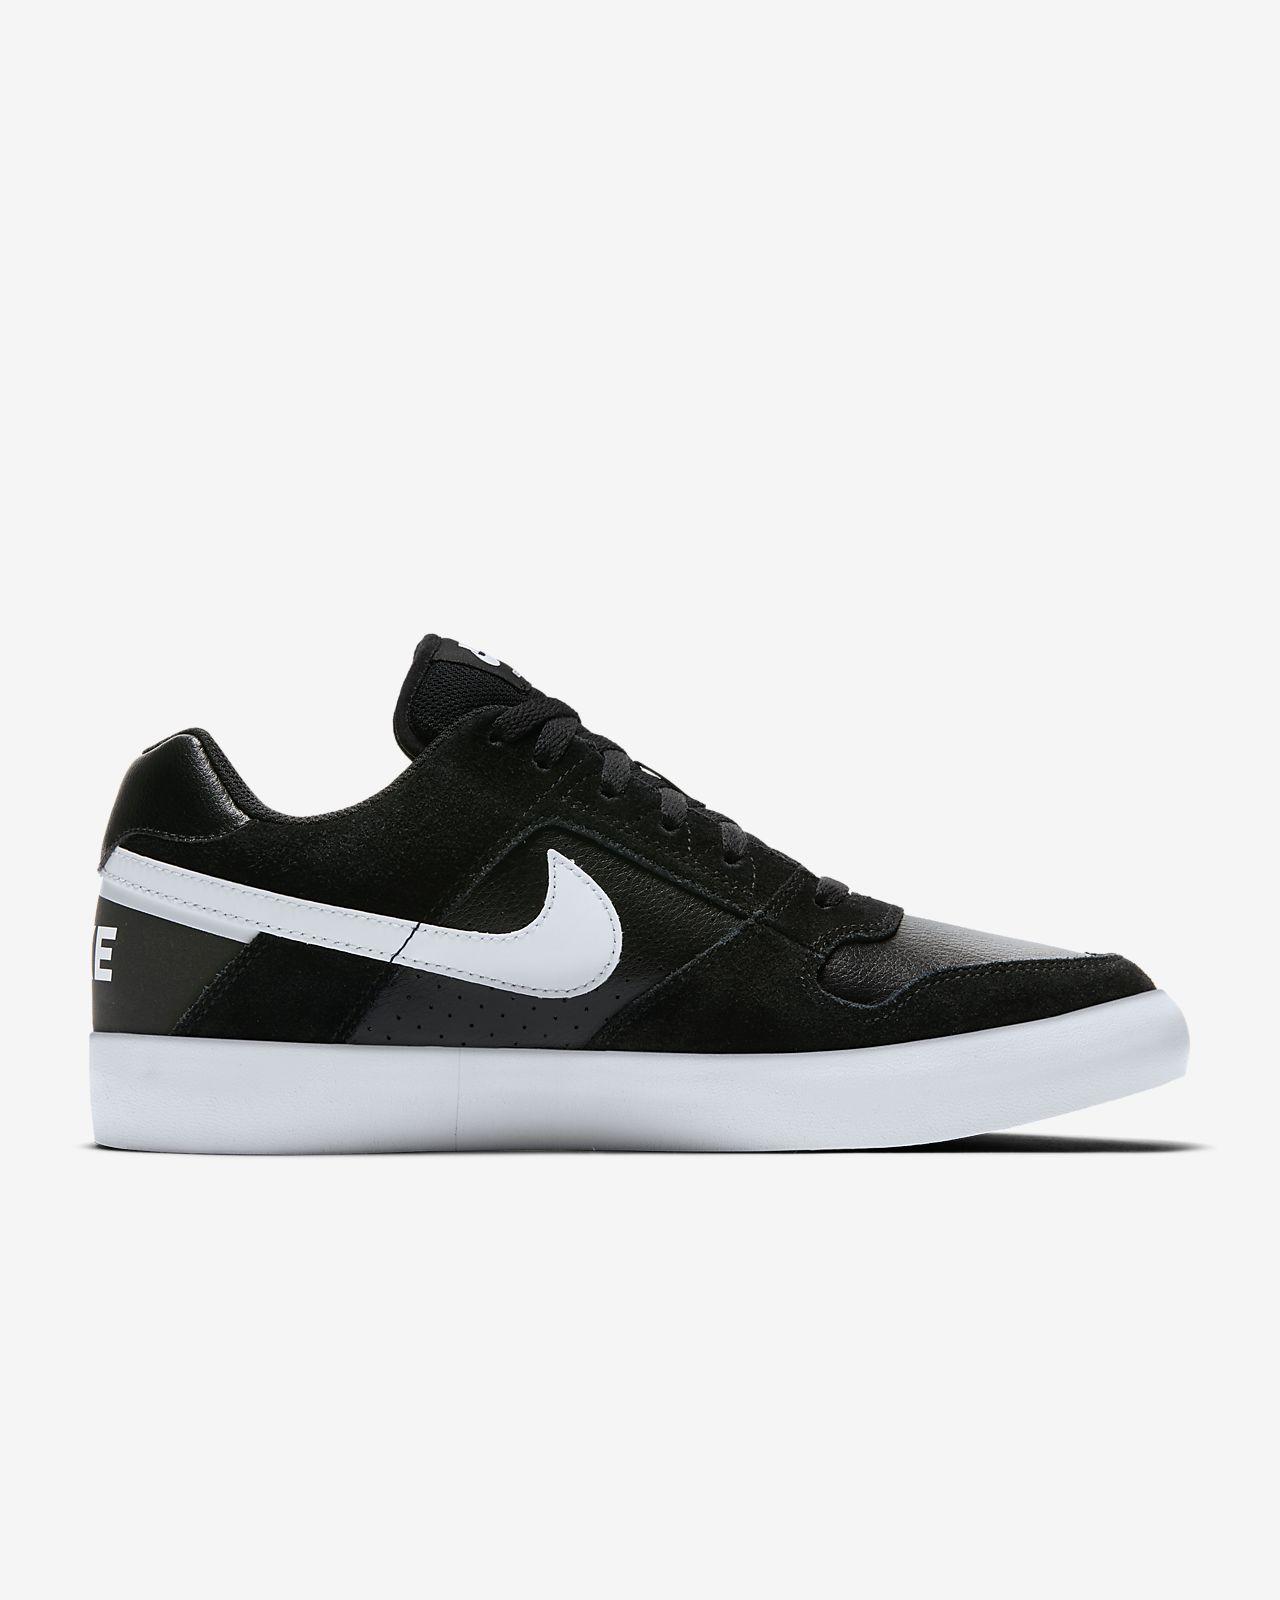 Nike SB Delta Force VULC Damen And Herren Schwarz Weiß Low